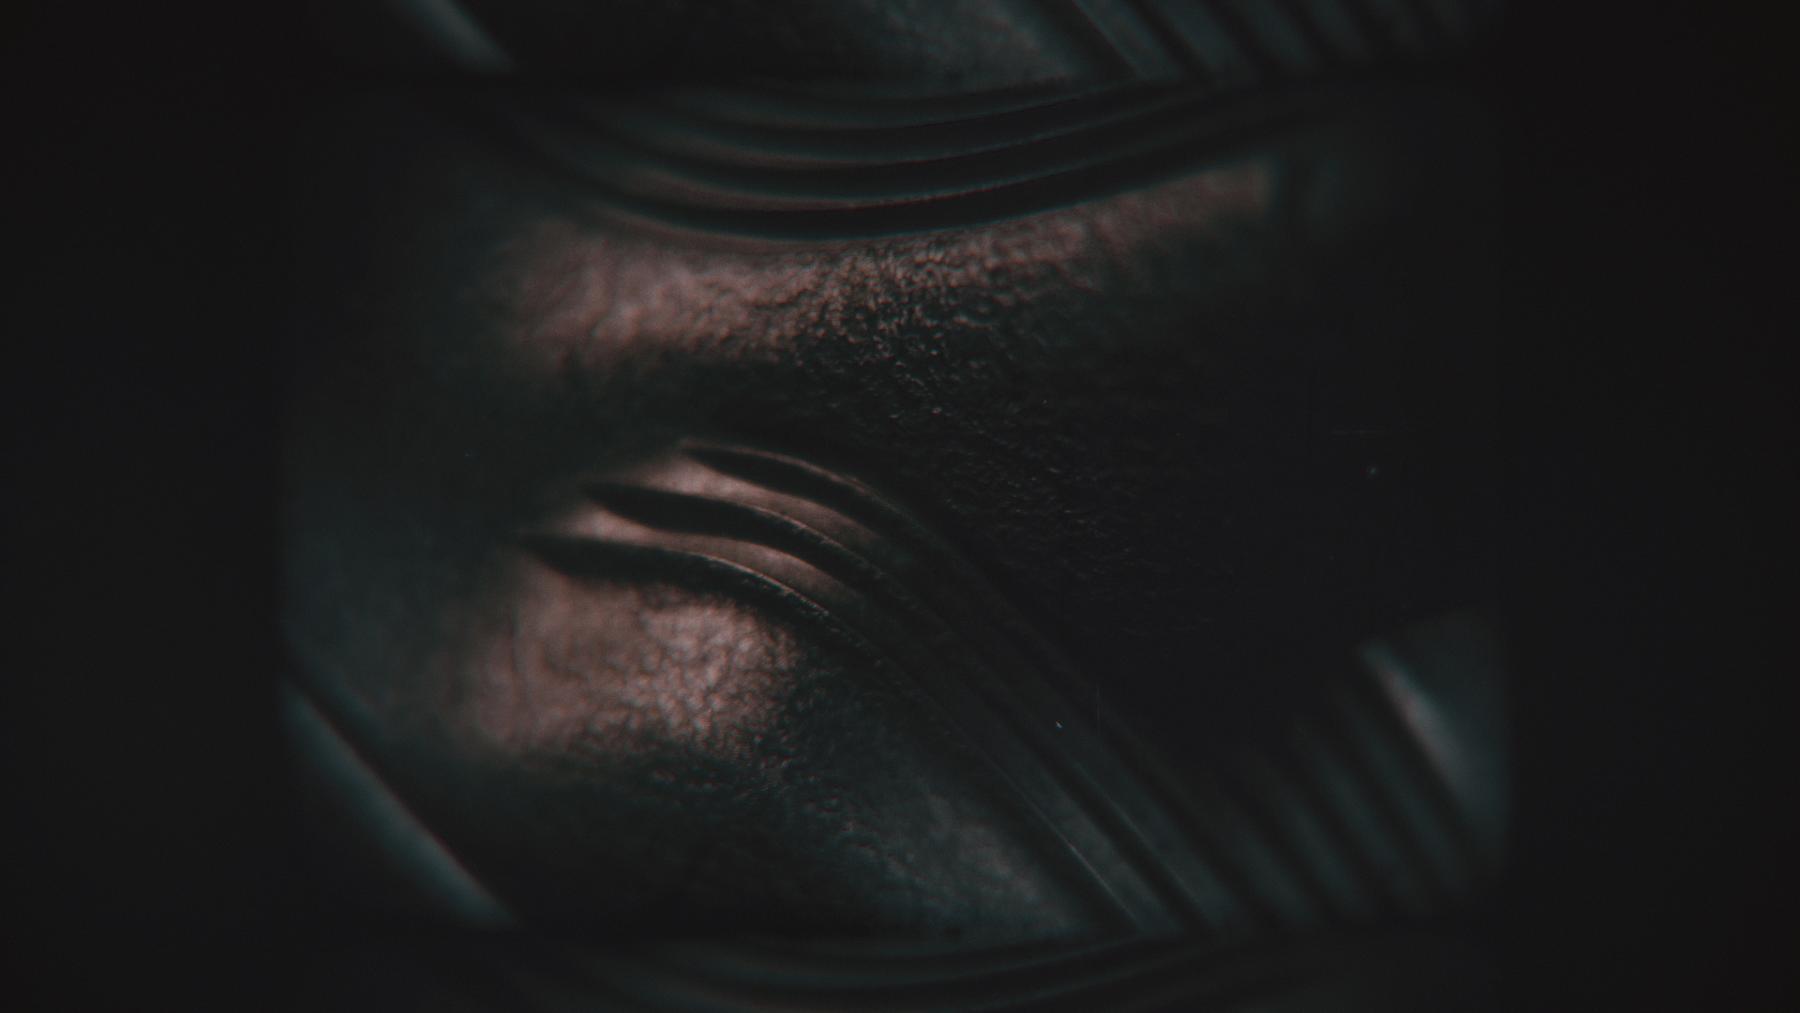 SINISTER_2_BOARDS_01